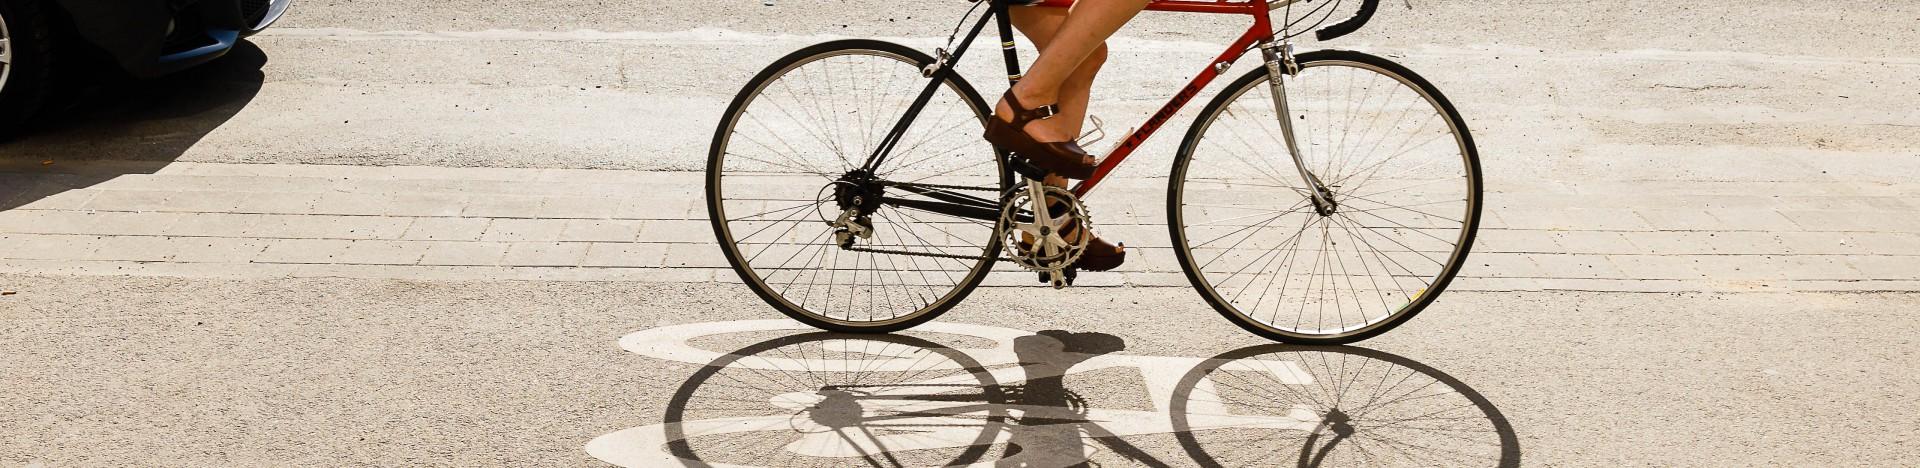 Cycloparking